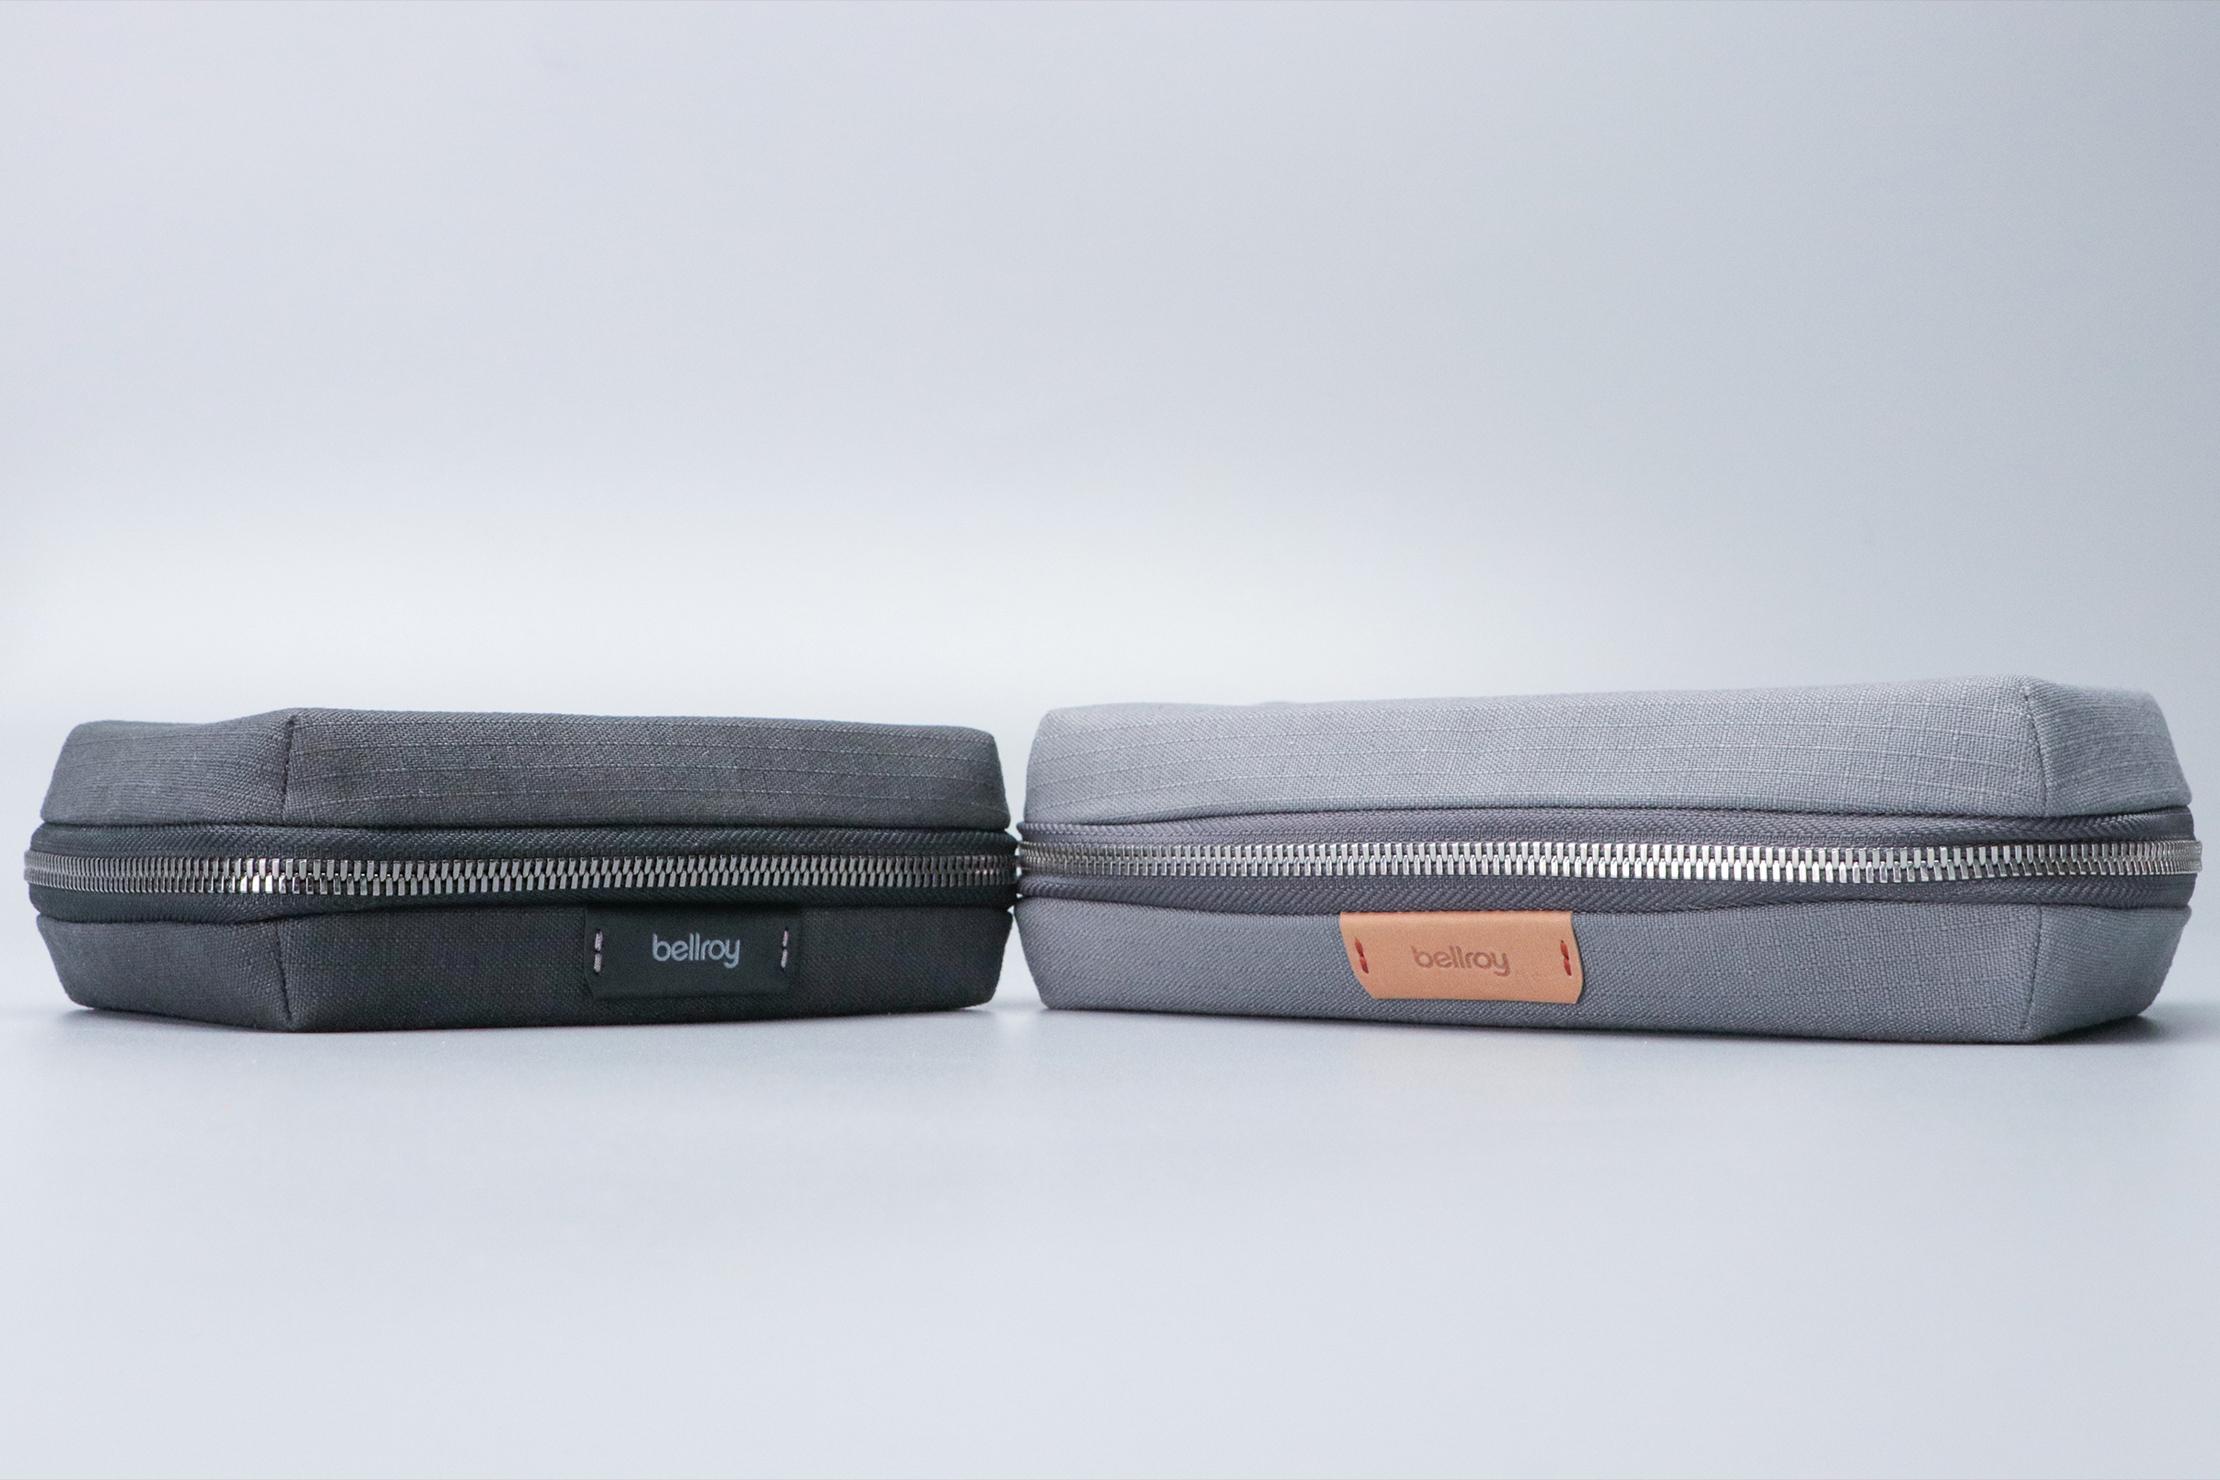 Bellroy Tech Kit Compact Comparison